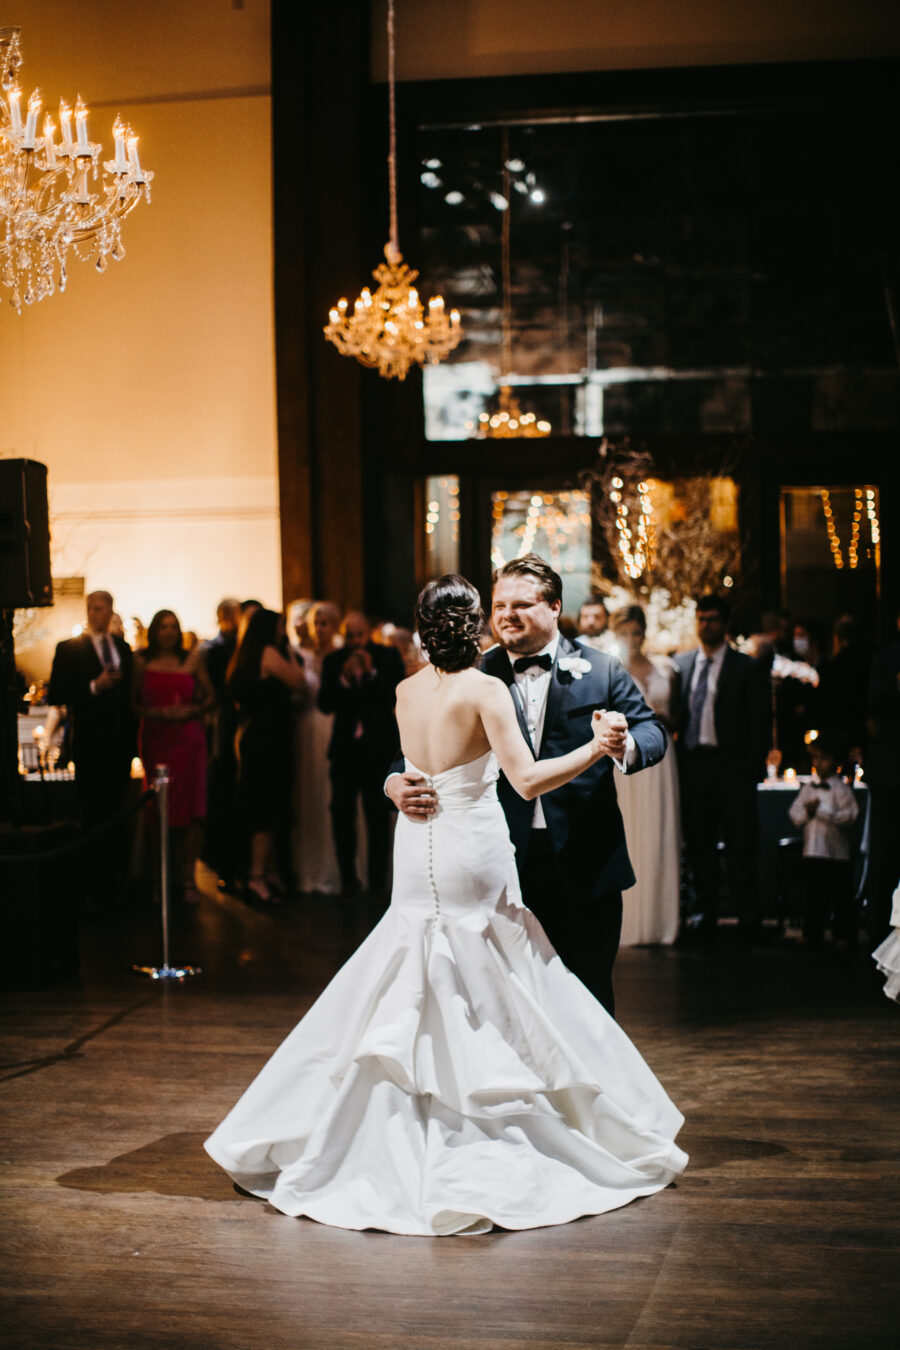 Wedding first dance | Nashville Bride Guide